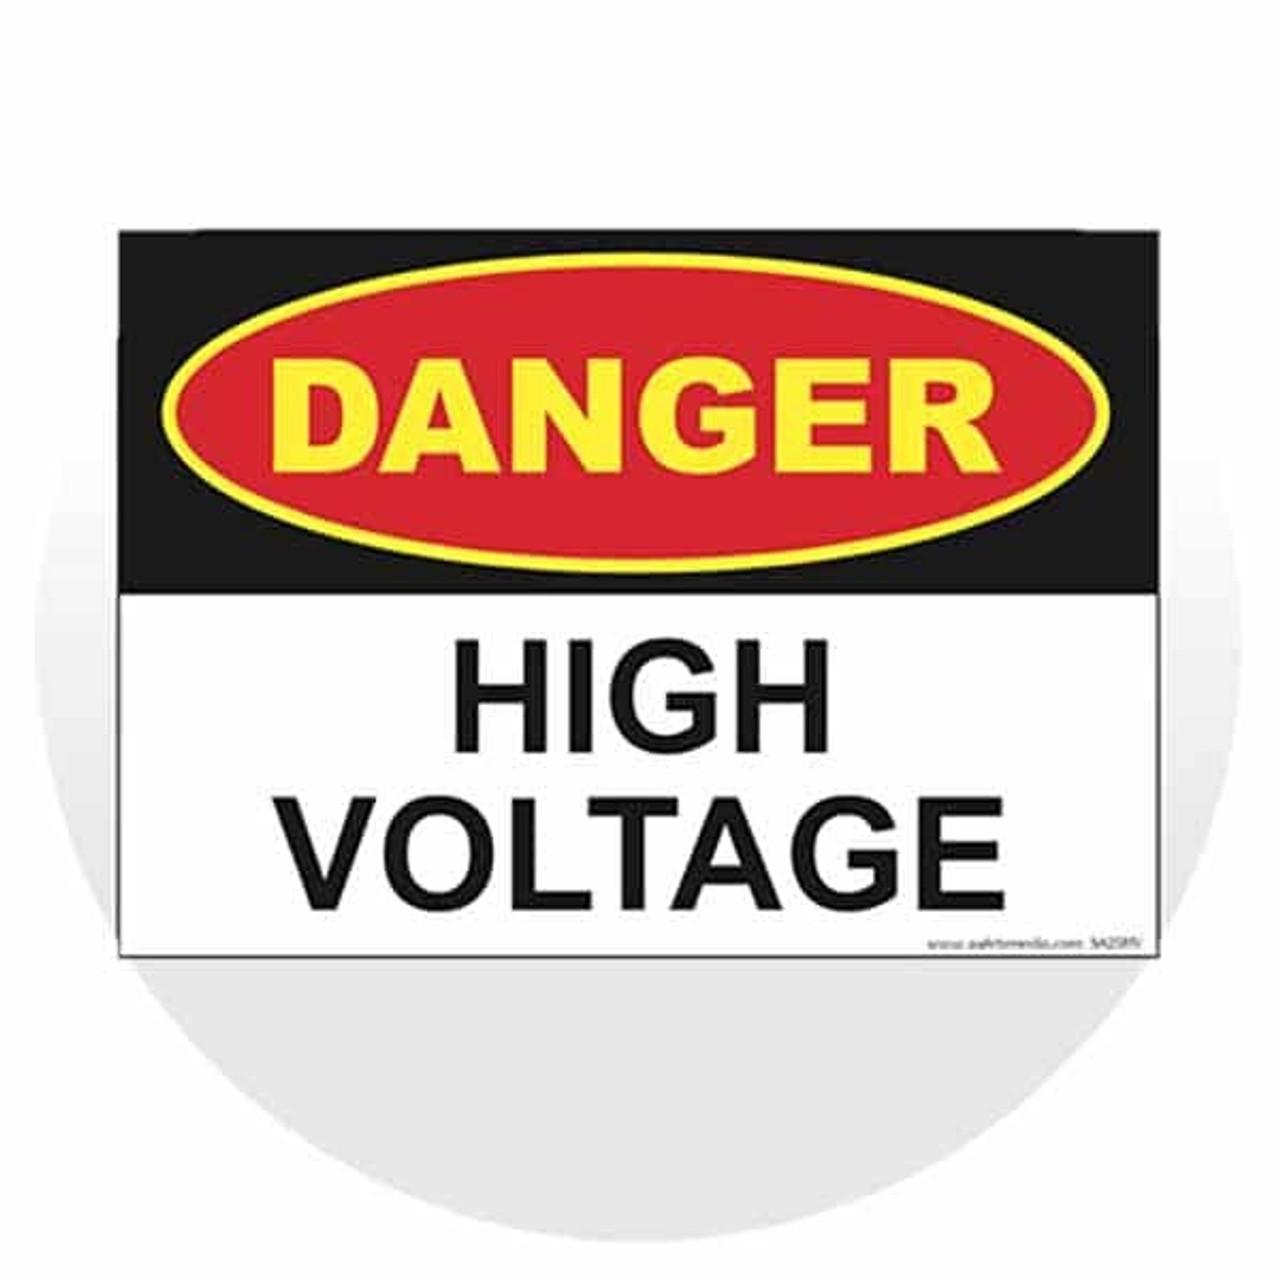 Vinyl & Plastic Danger Signs